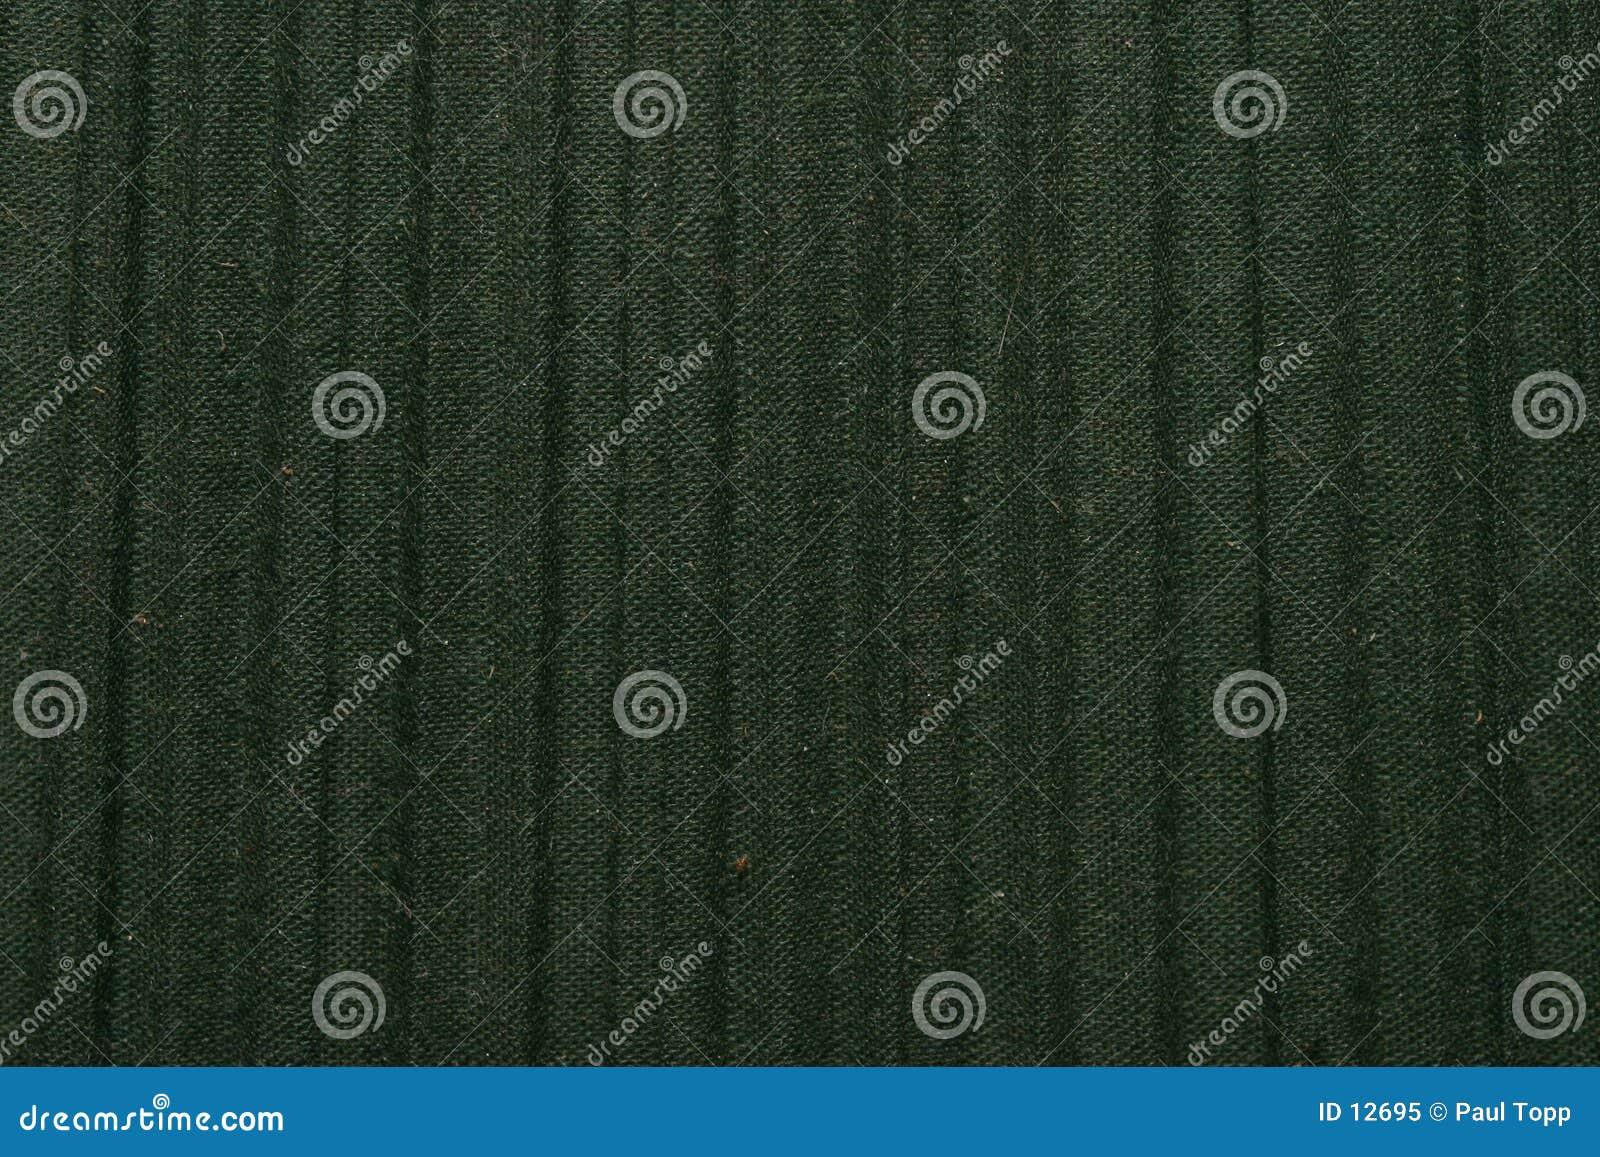 Dark Fabric Texture for Background